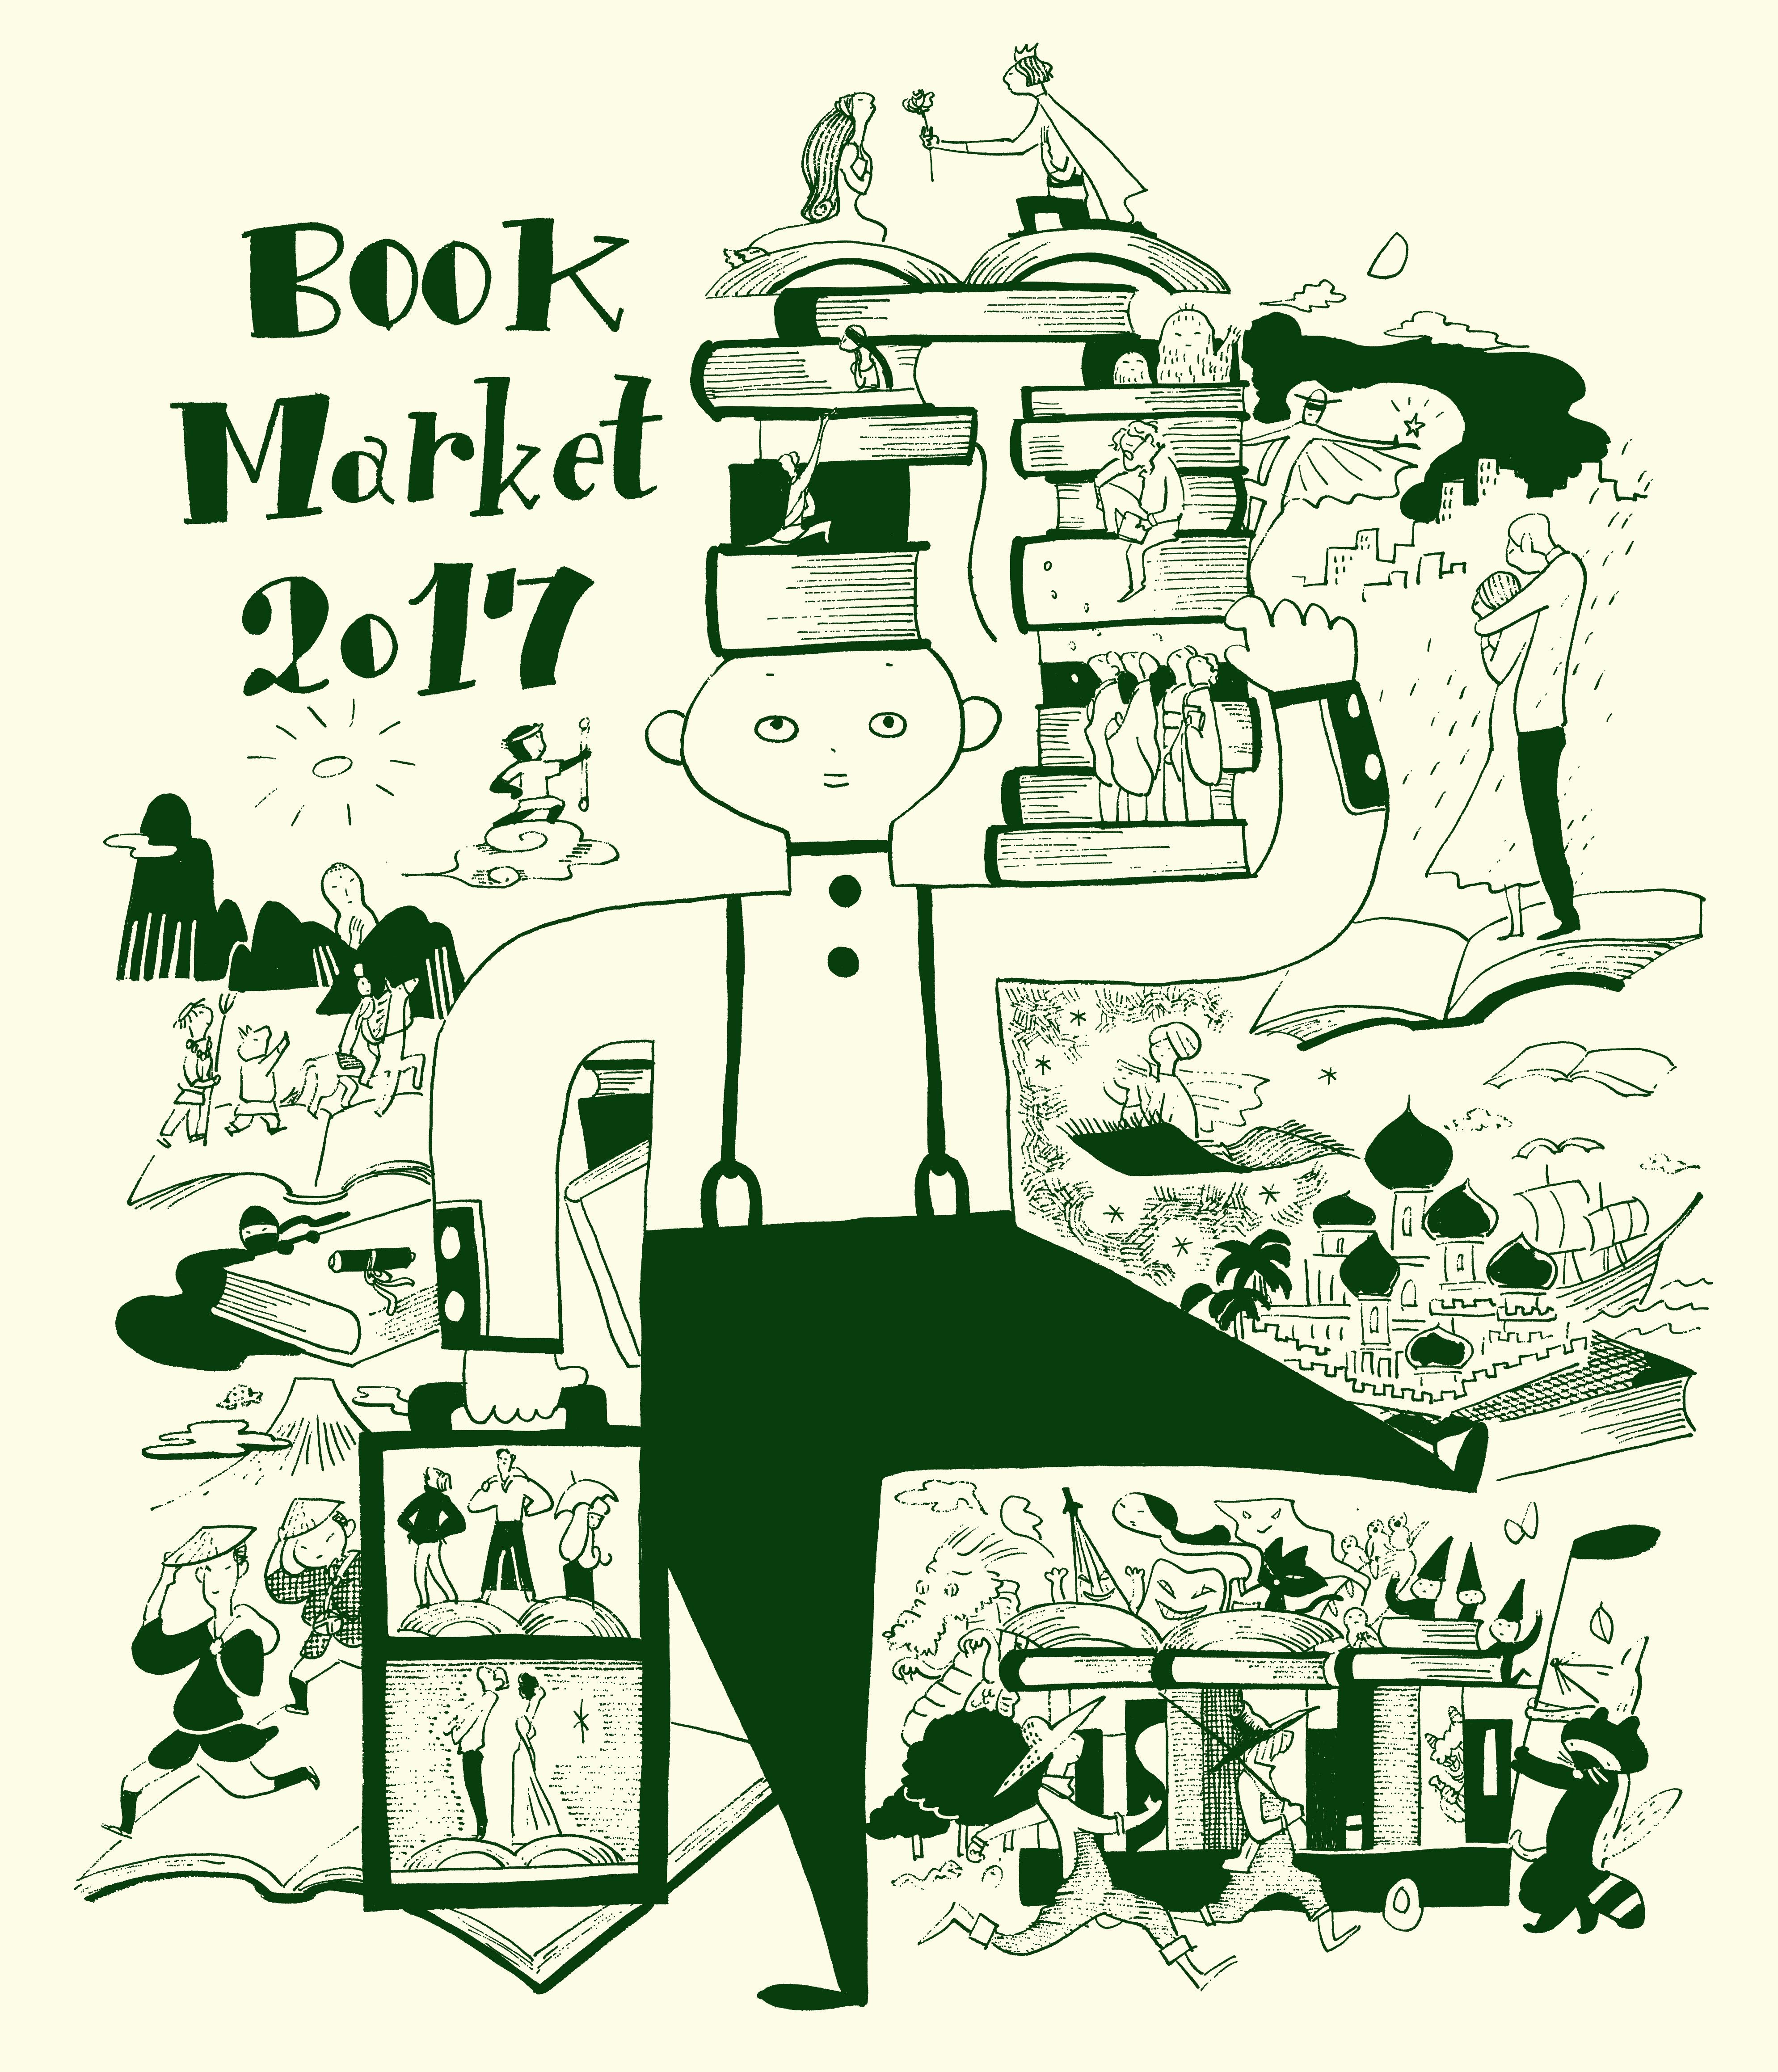 BOOK MARKET 2017に今年も出店します!